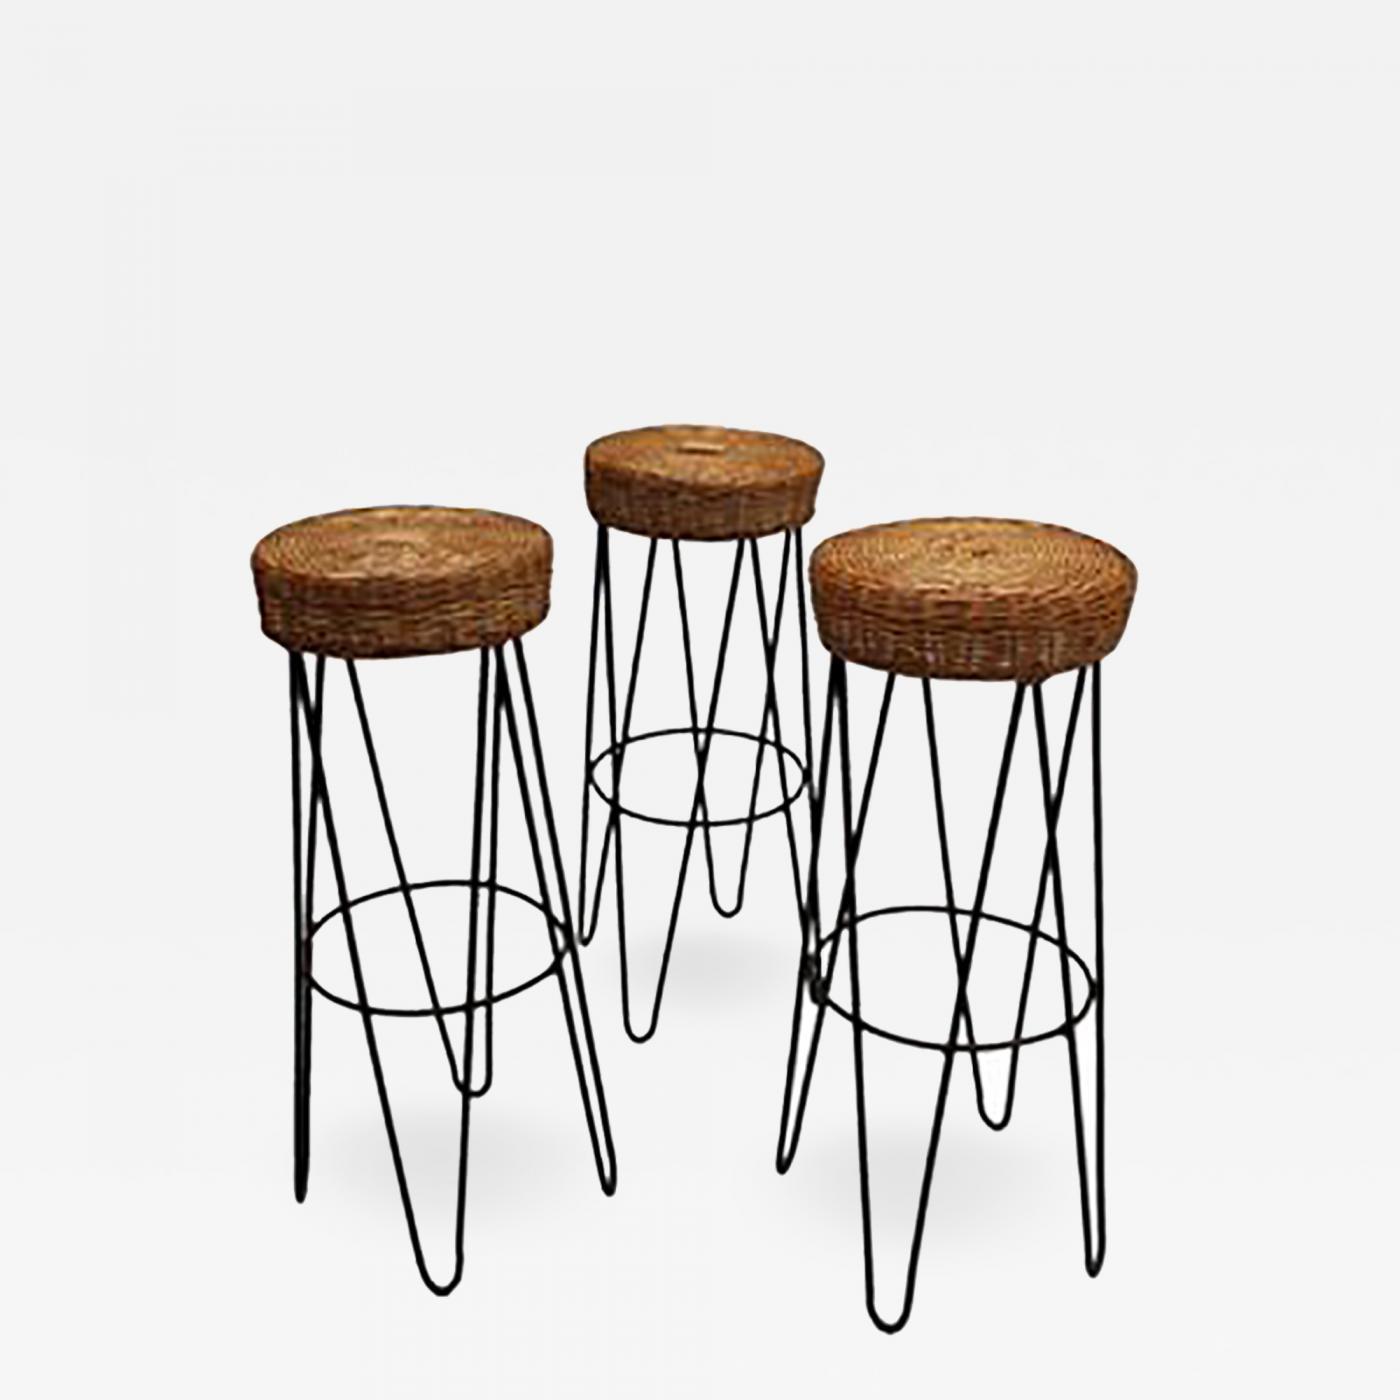 Outstanding Three French Black Metal And Rattan Bar Stools 1950S Inzonedesignstudio Interior Chair Design Inzonedesignstudiocom